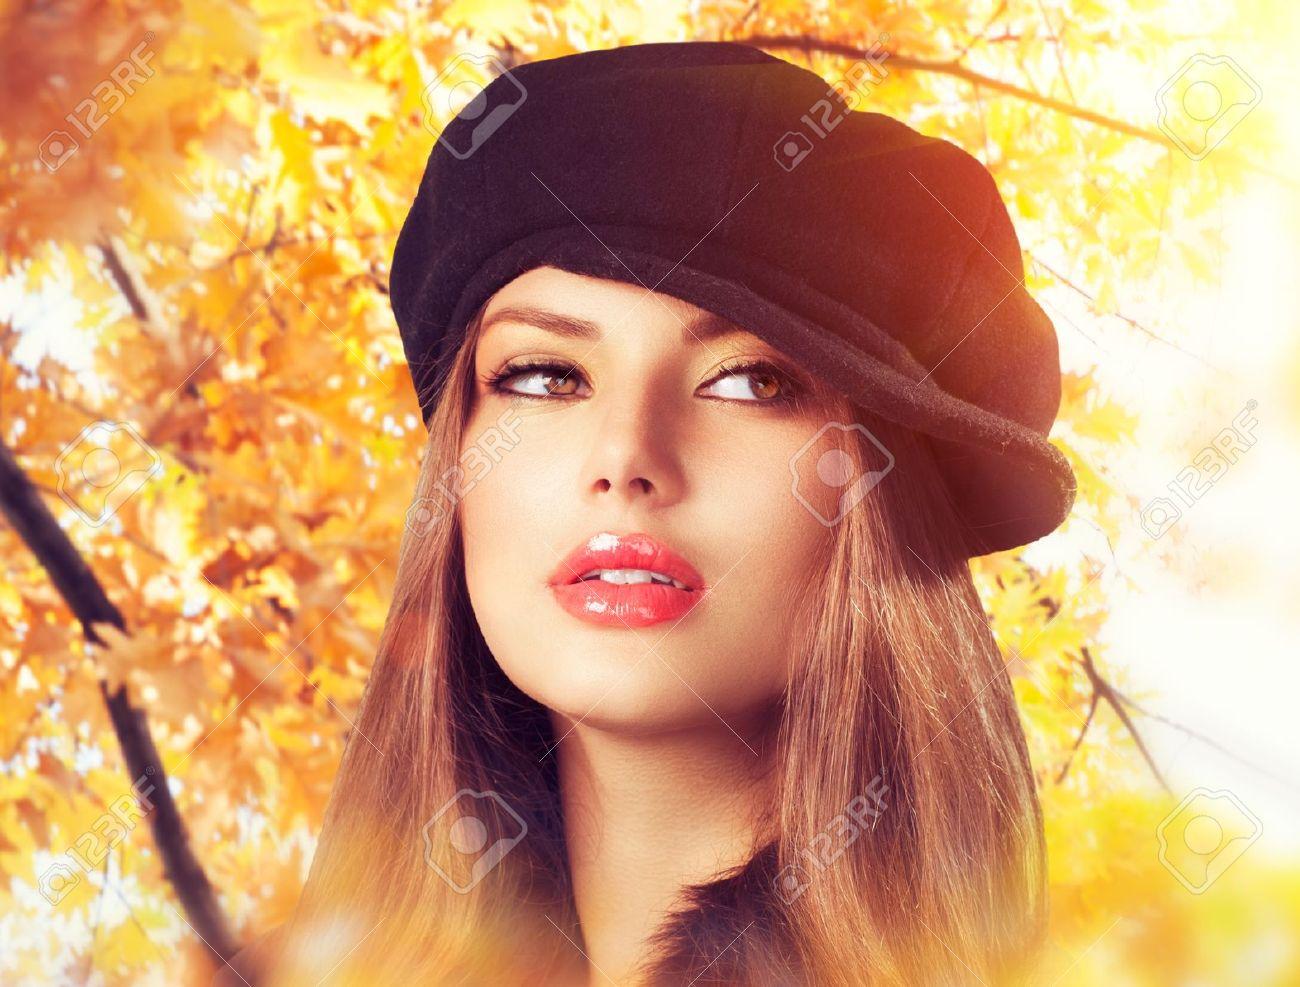 Autumn Woman in a Beret Hat Fashion Autumn Wear Stock Photo - 21563952 95b2aff5105